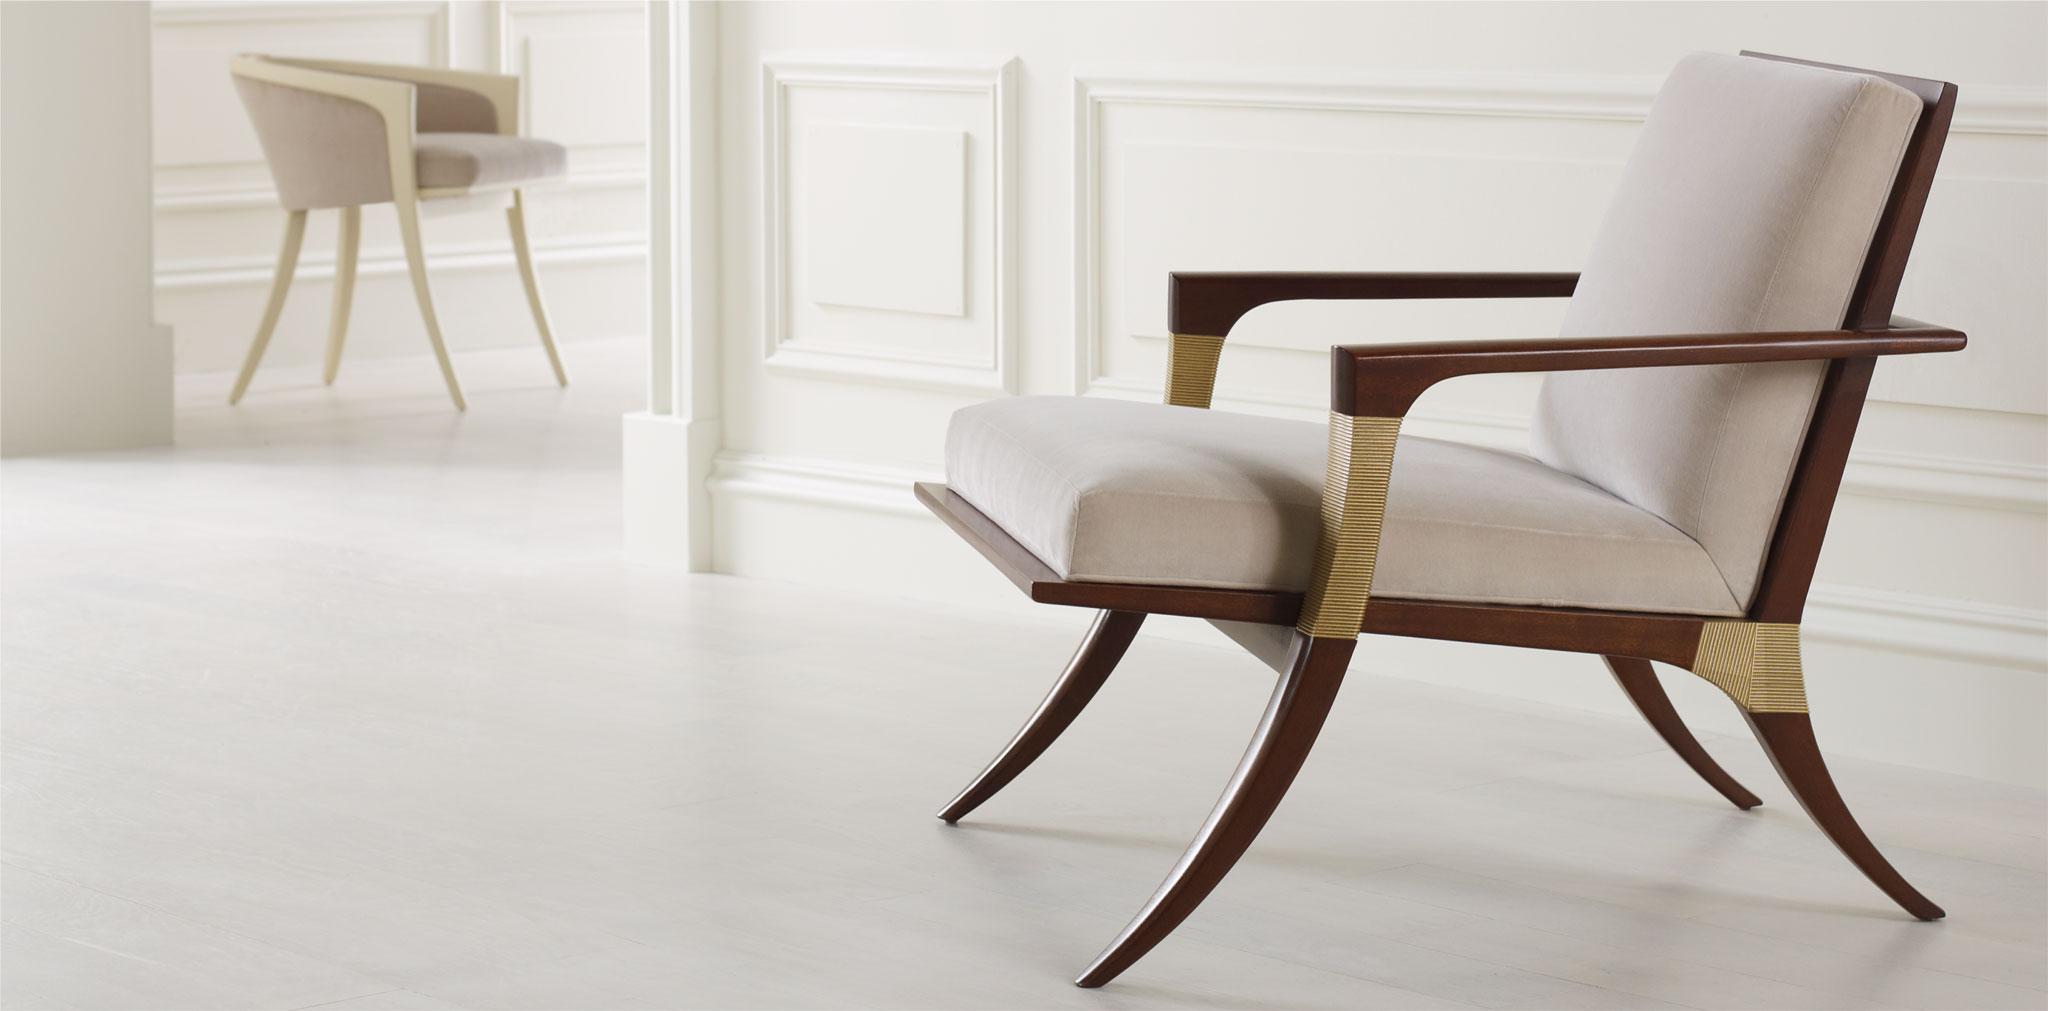 high end furniture pj newman interiors - fine furniture XWYJCXK